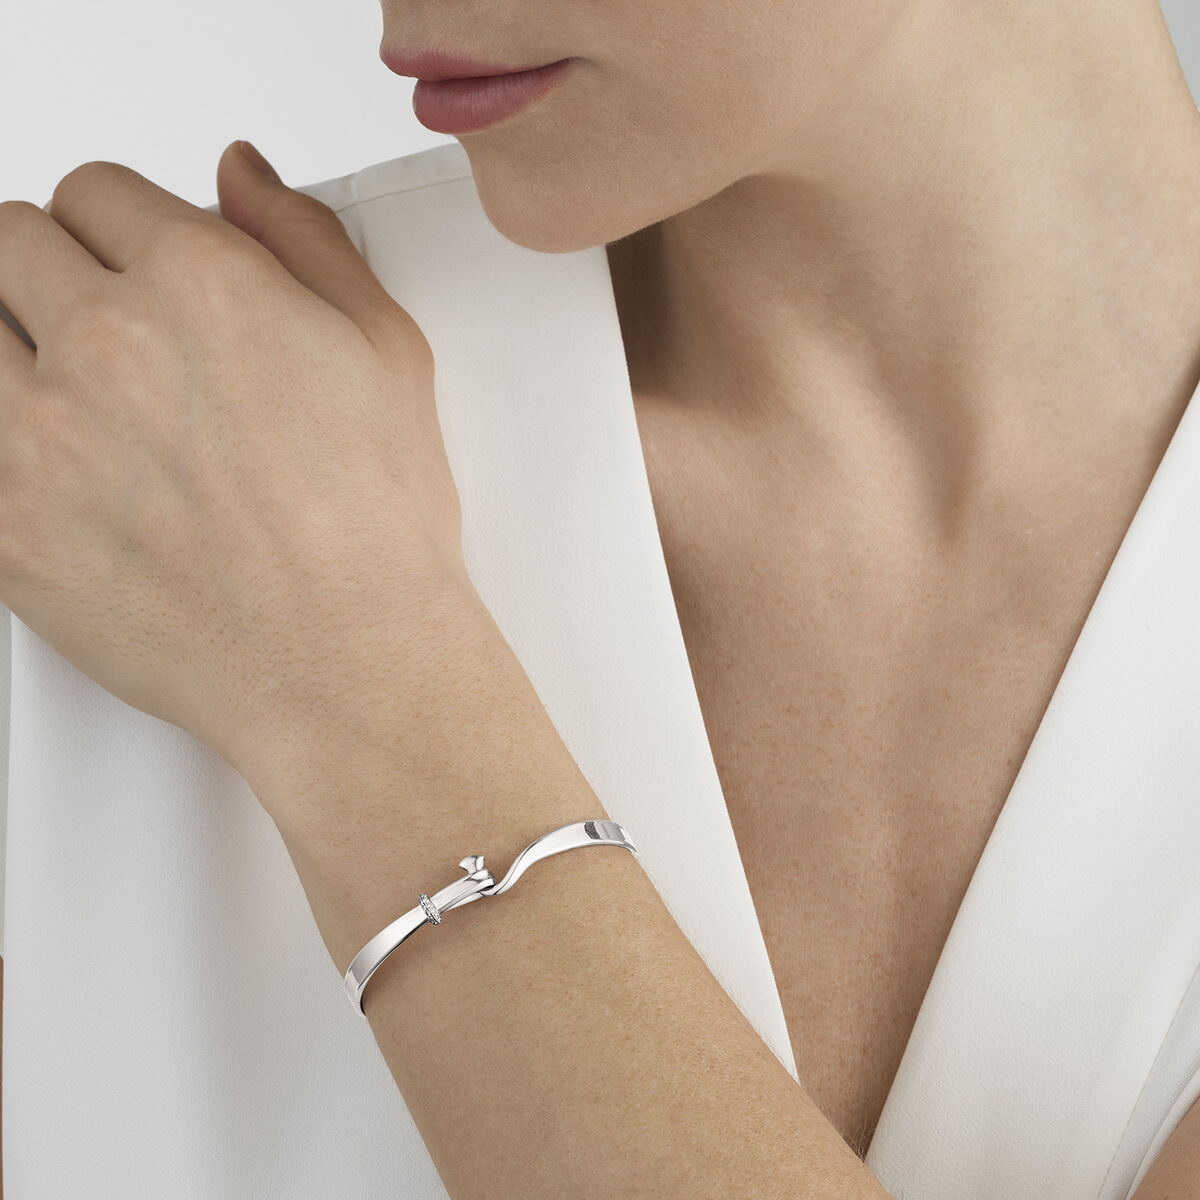 pack__3531283-TORUN-bangle-silver-diamond